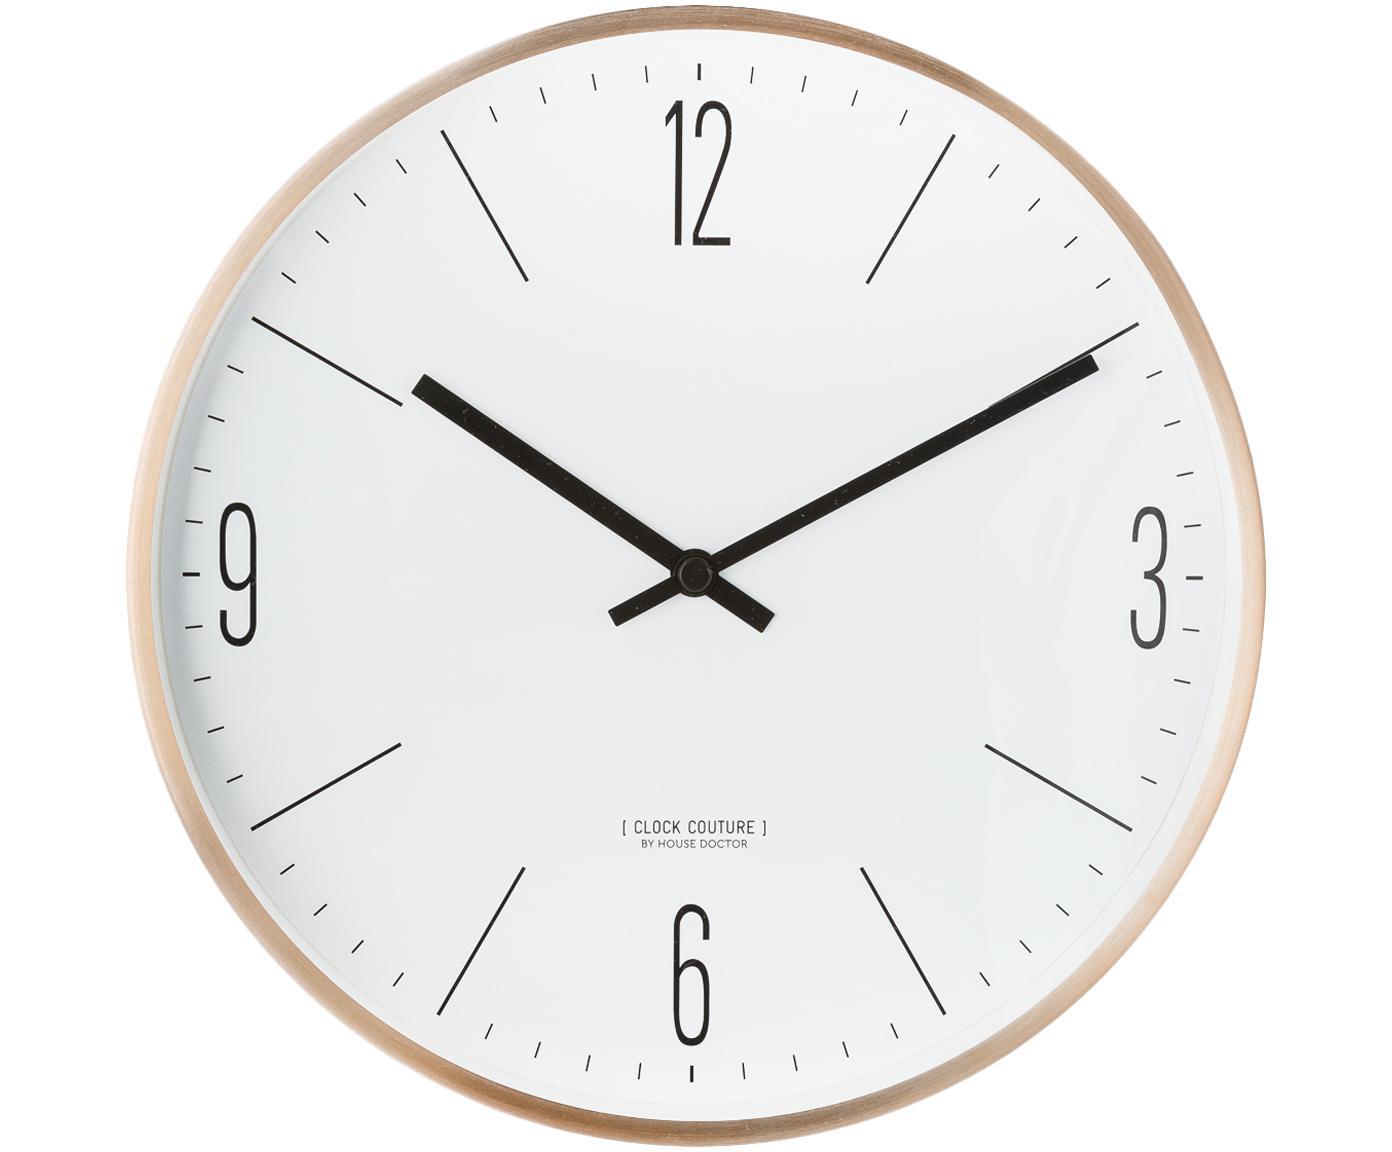 Wandklok Couture, Aluminium, Goudkleurig, wit, Ø 30 cm